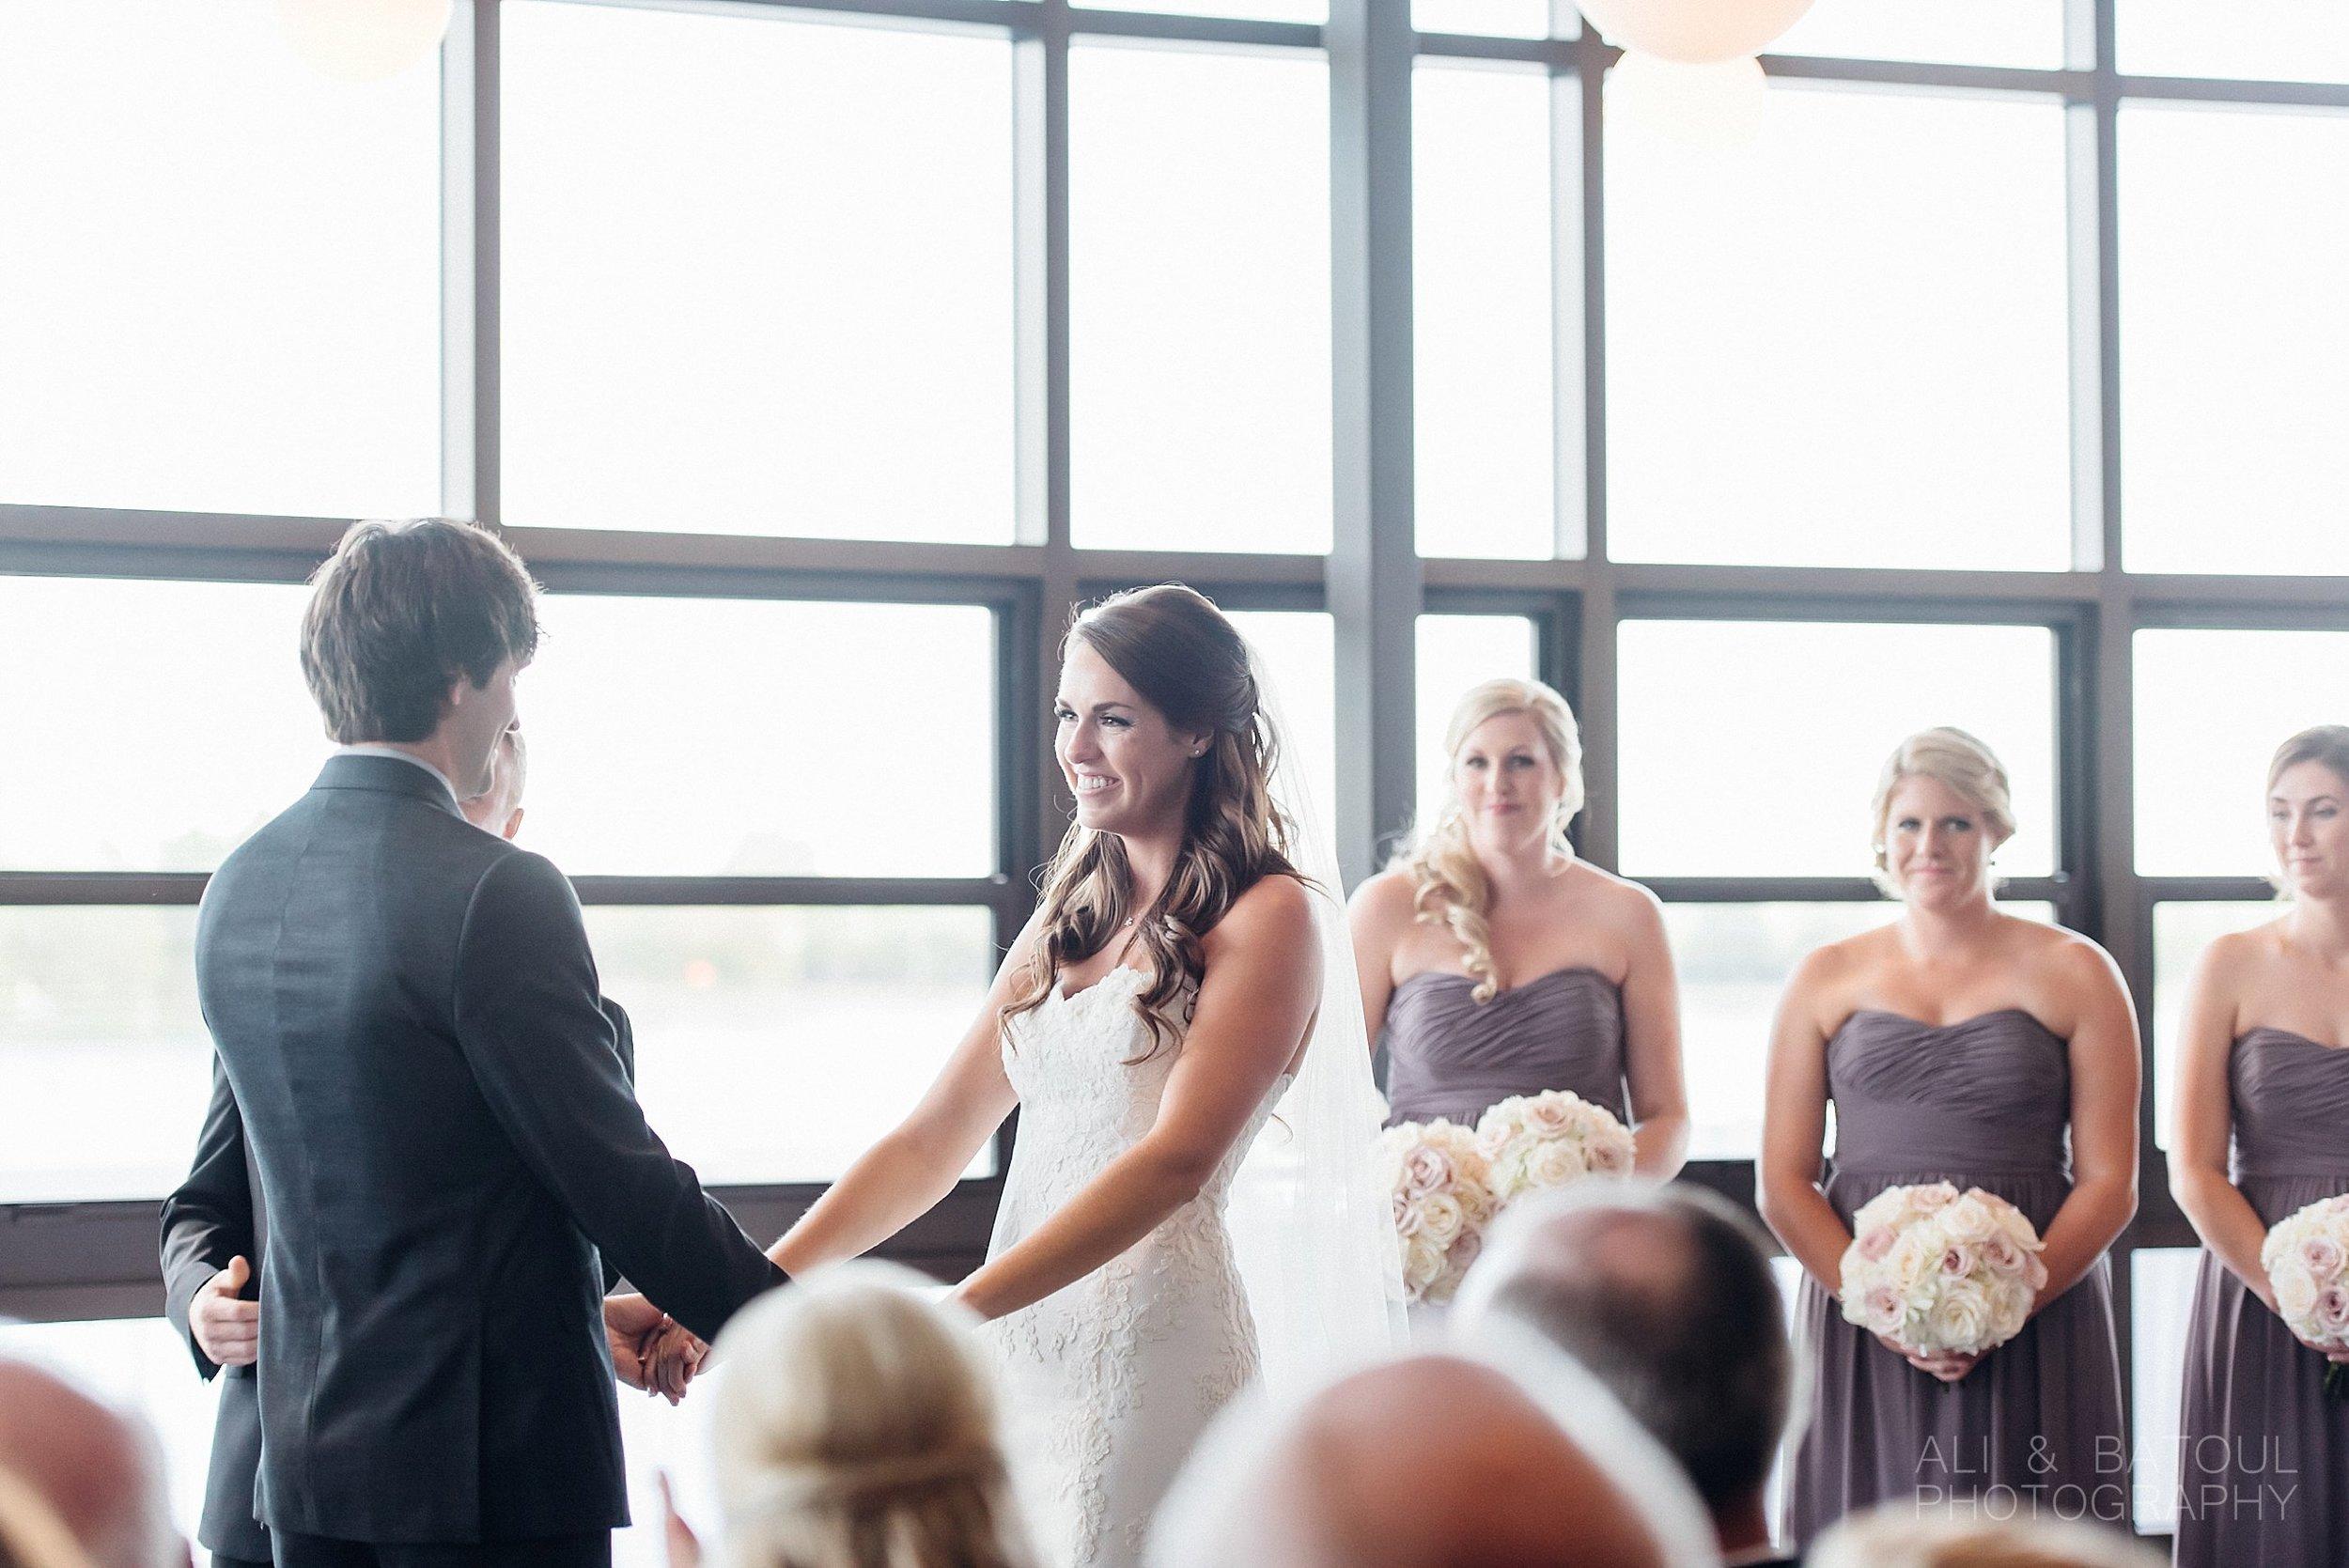 Ali & Batoul Photography - Documentary Fine Art Ottawa Wedding Photography_0036.jpg